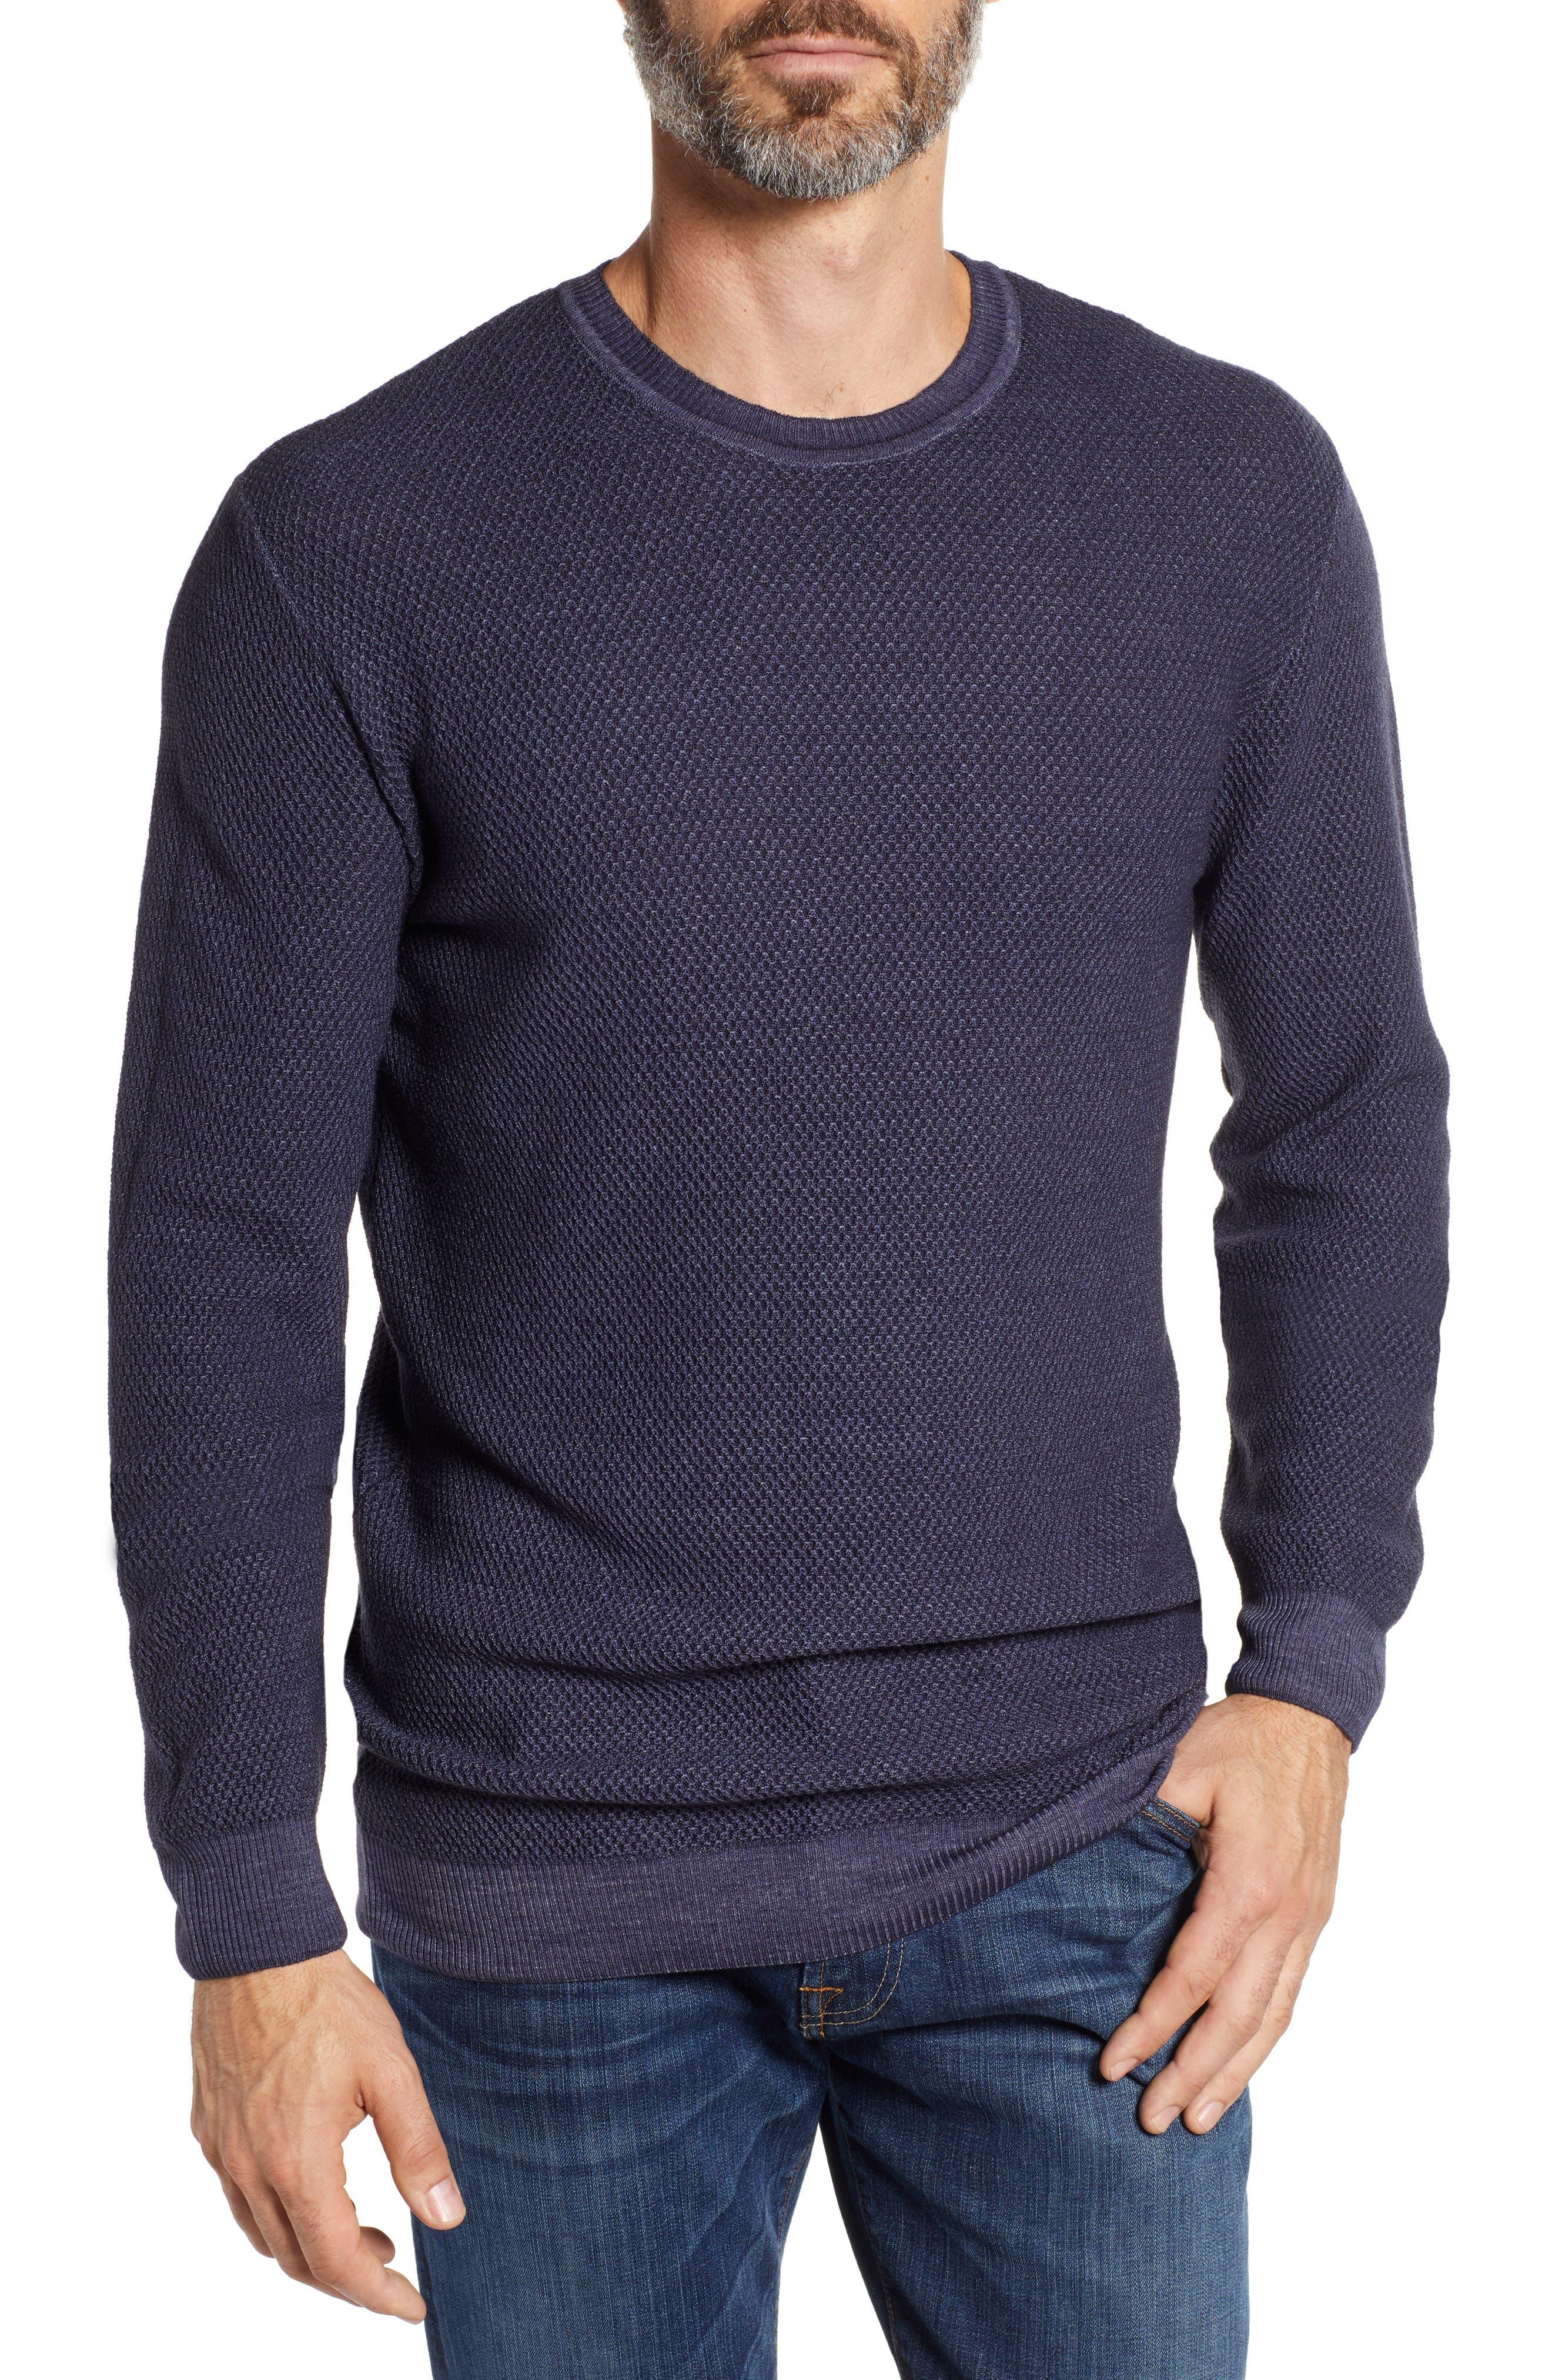 Stone Rose Honeycomb Trim Fit Wool Sweater, Black